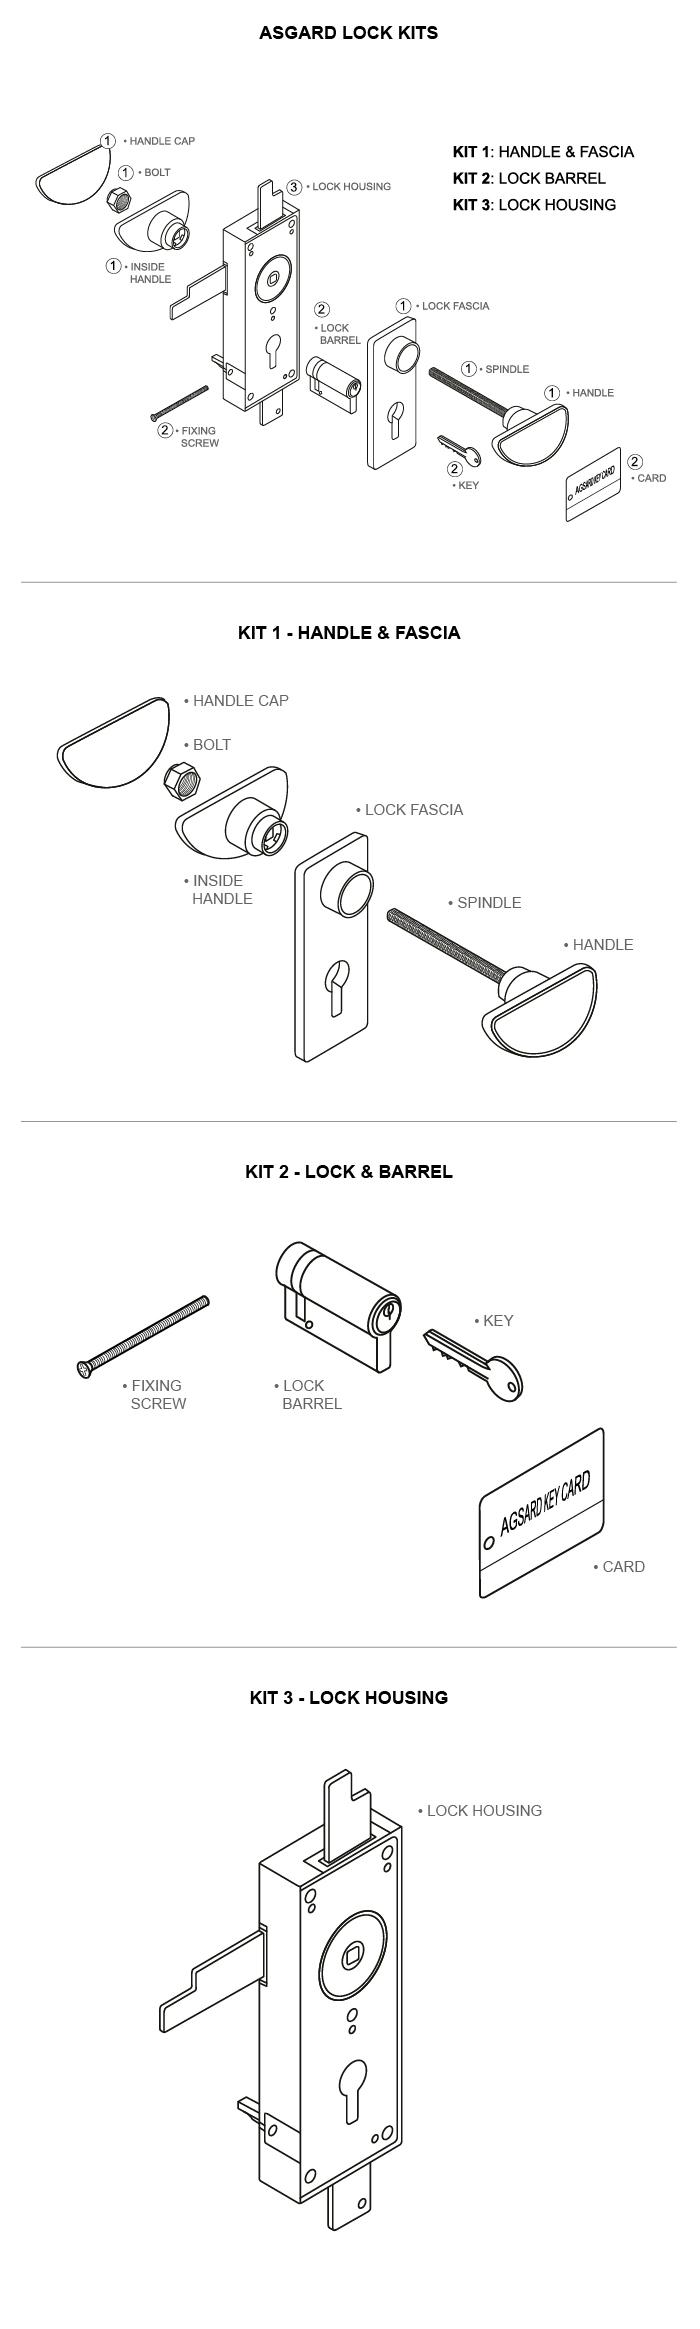 Asgard replacement lock parts